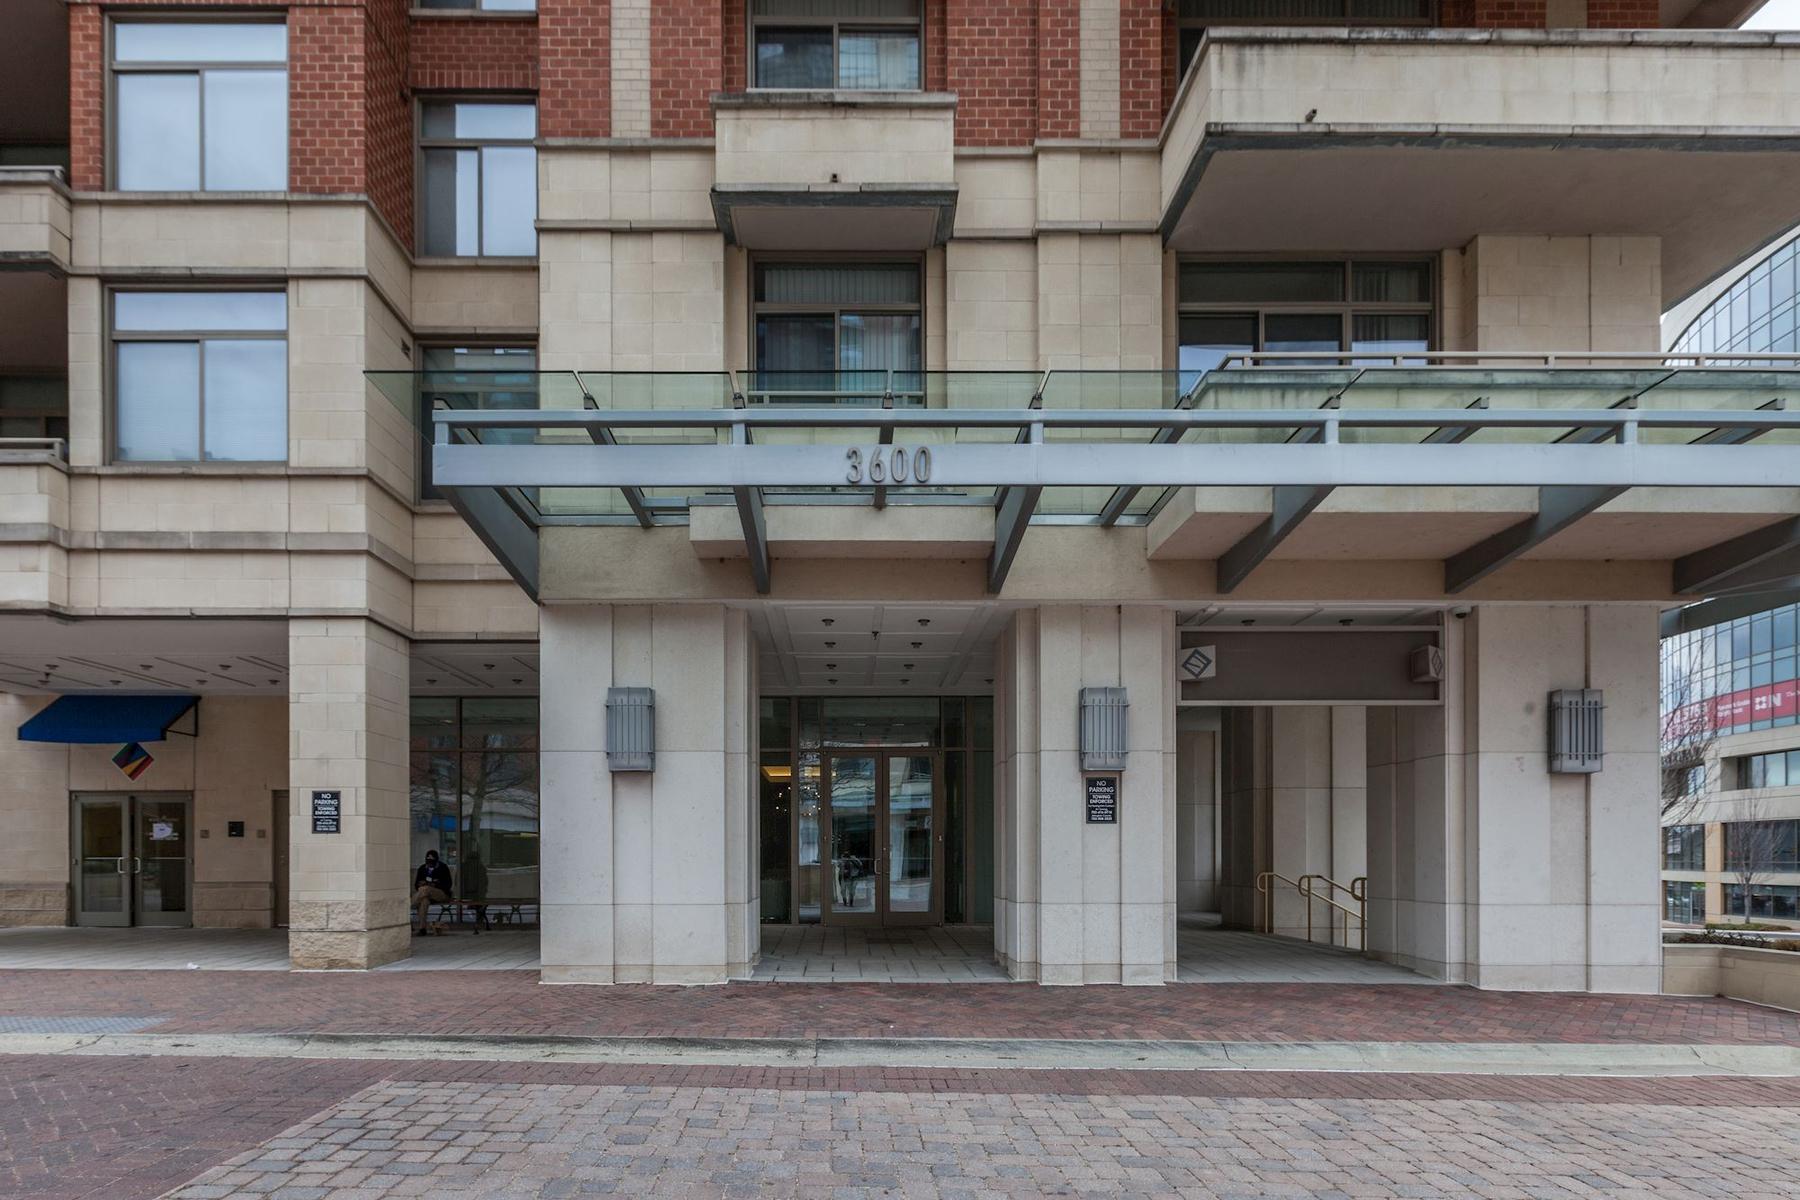 Condominium for Sale at The Eclipse on Center Park 3600 S Glebe Road S 222W Arlington, Virginia, 22202 United States